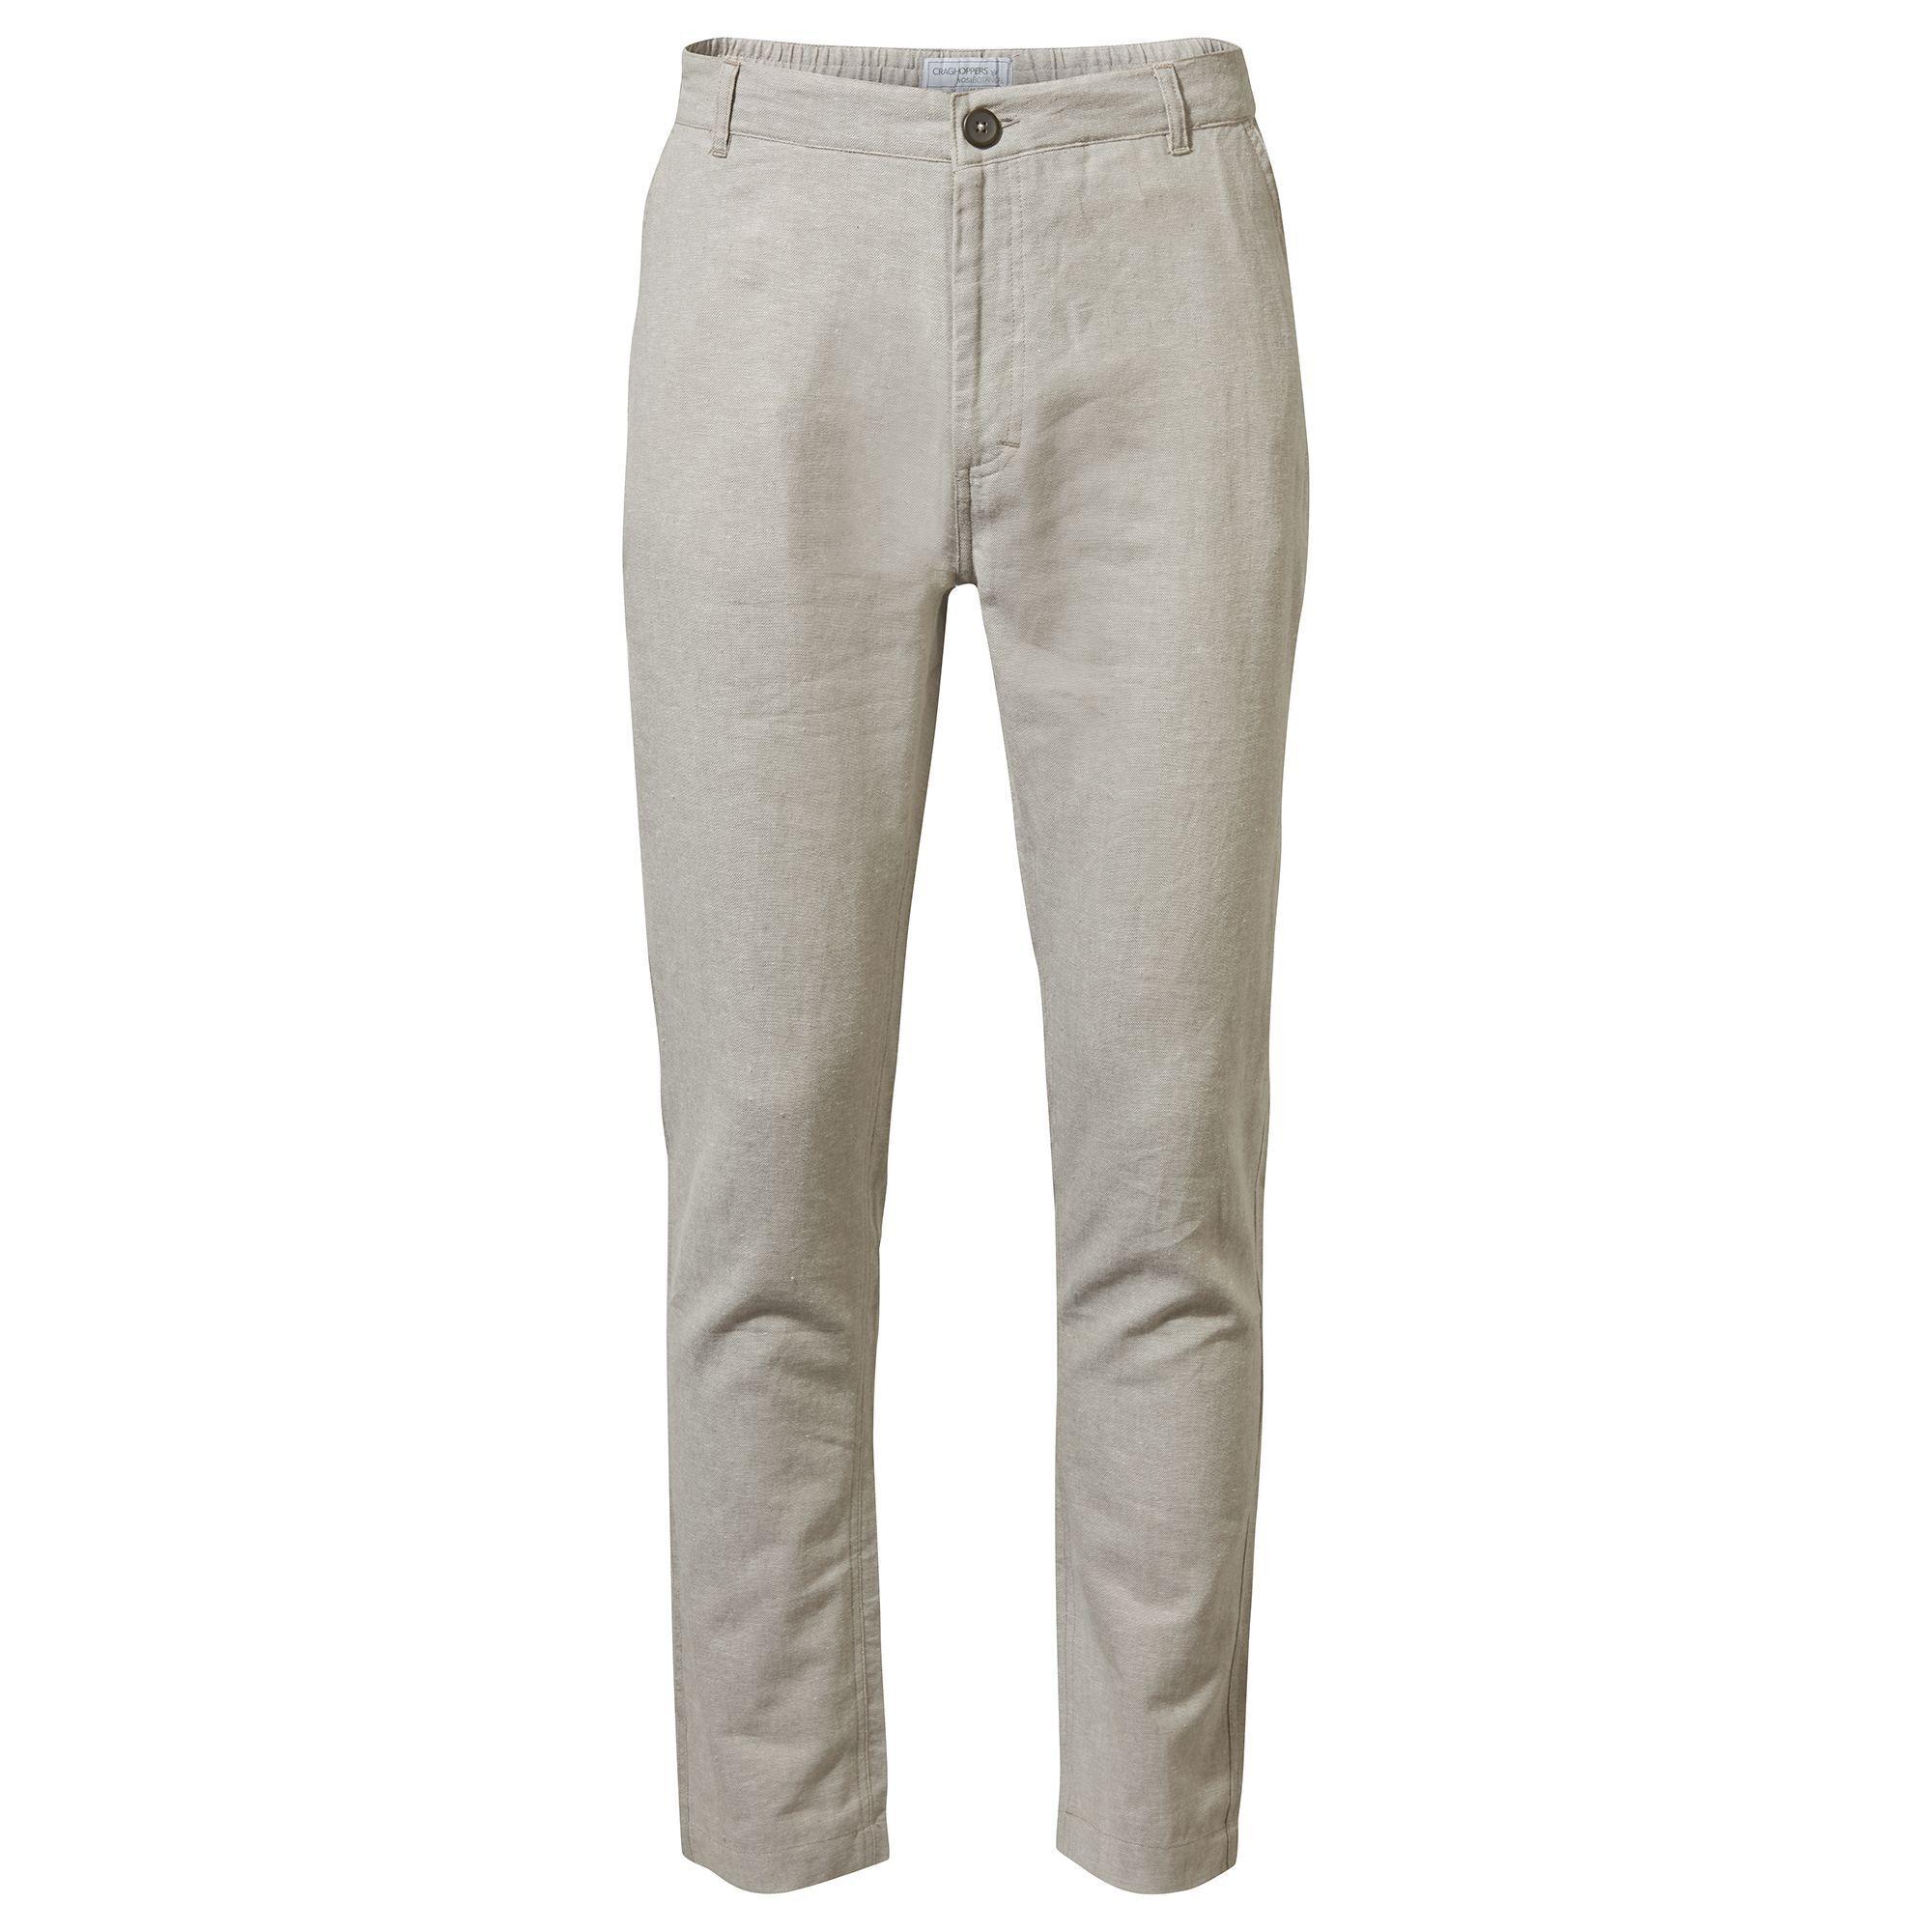 Craghoppers Mens Kier Sleek Trousers (30S) (Parchment White Marl)